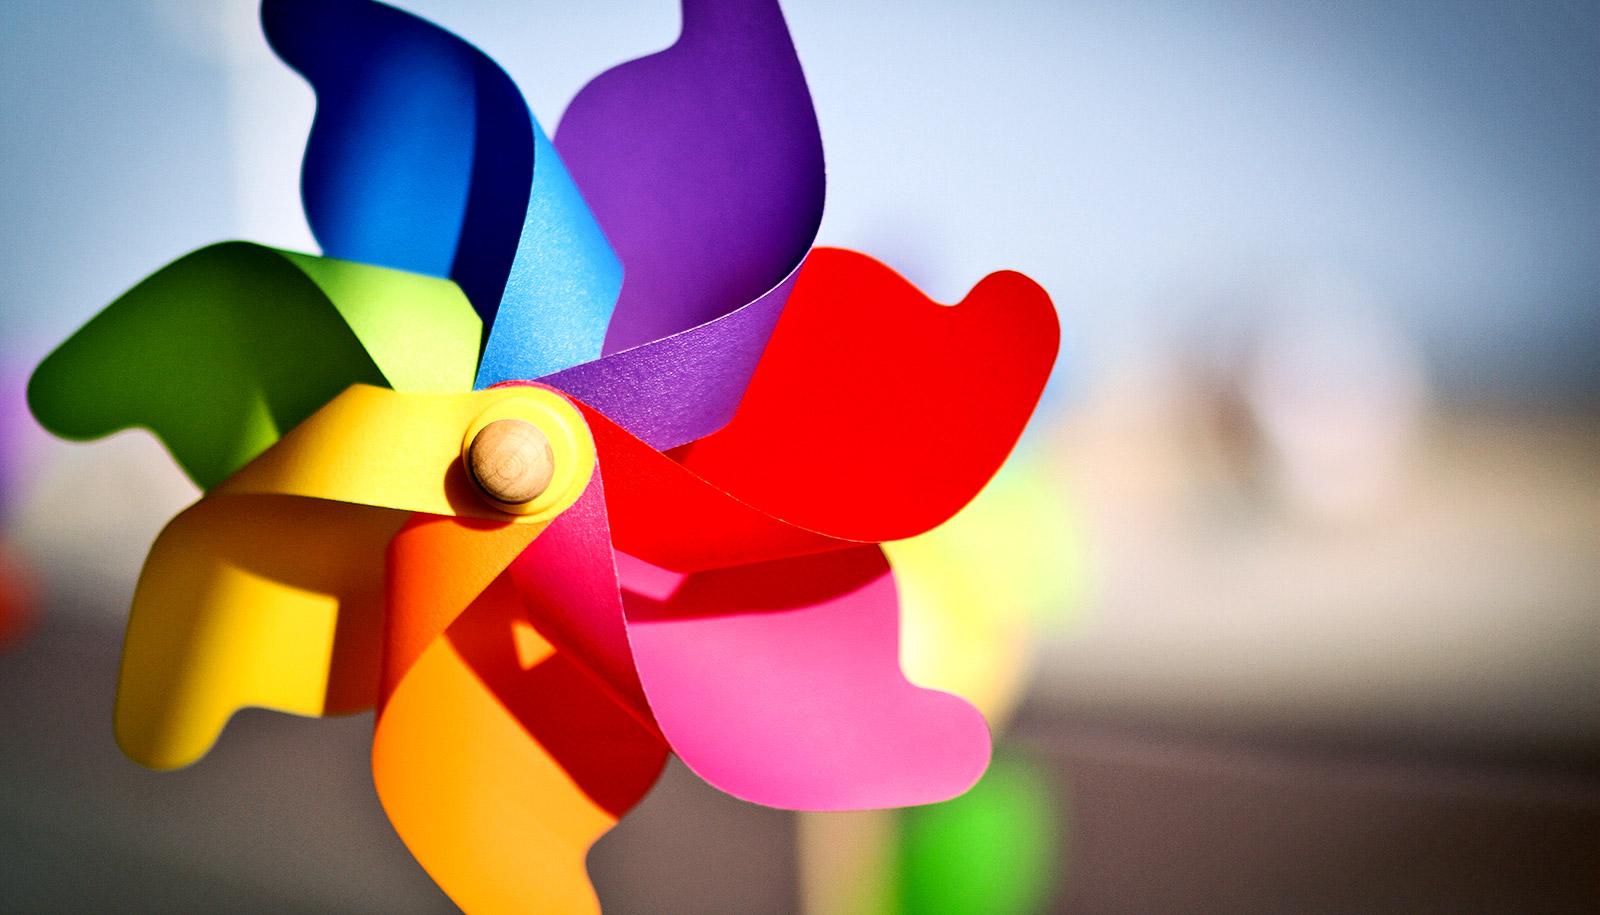 colorful-pinwheel_1555029031892.jpg